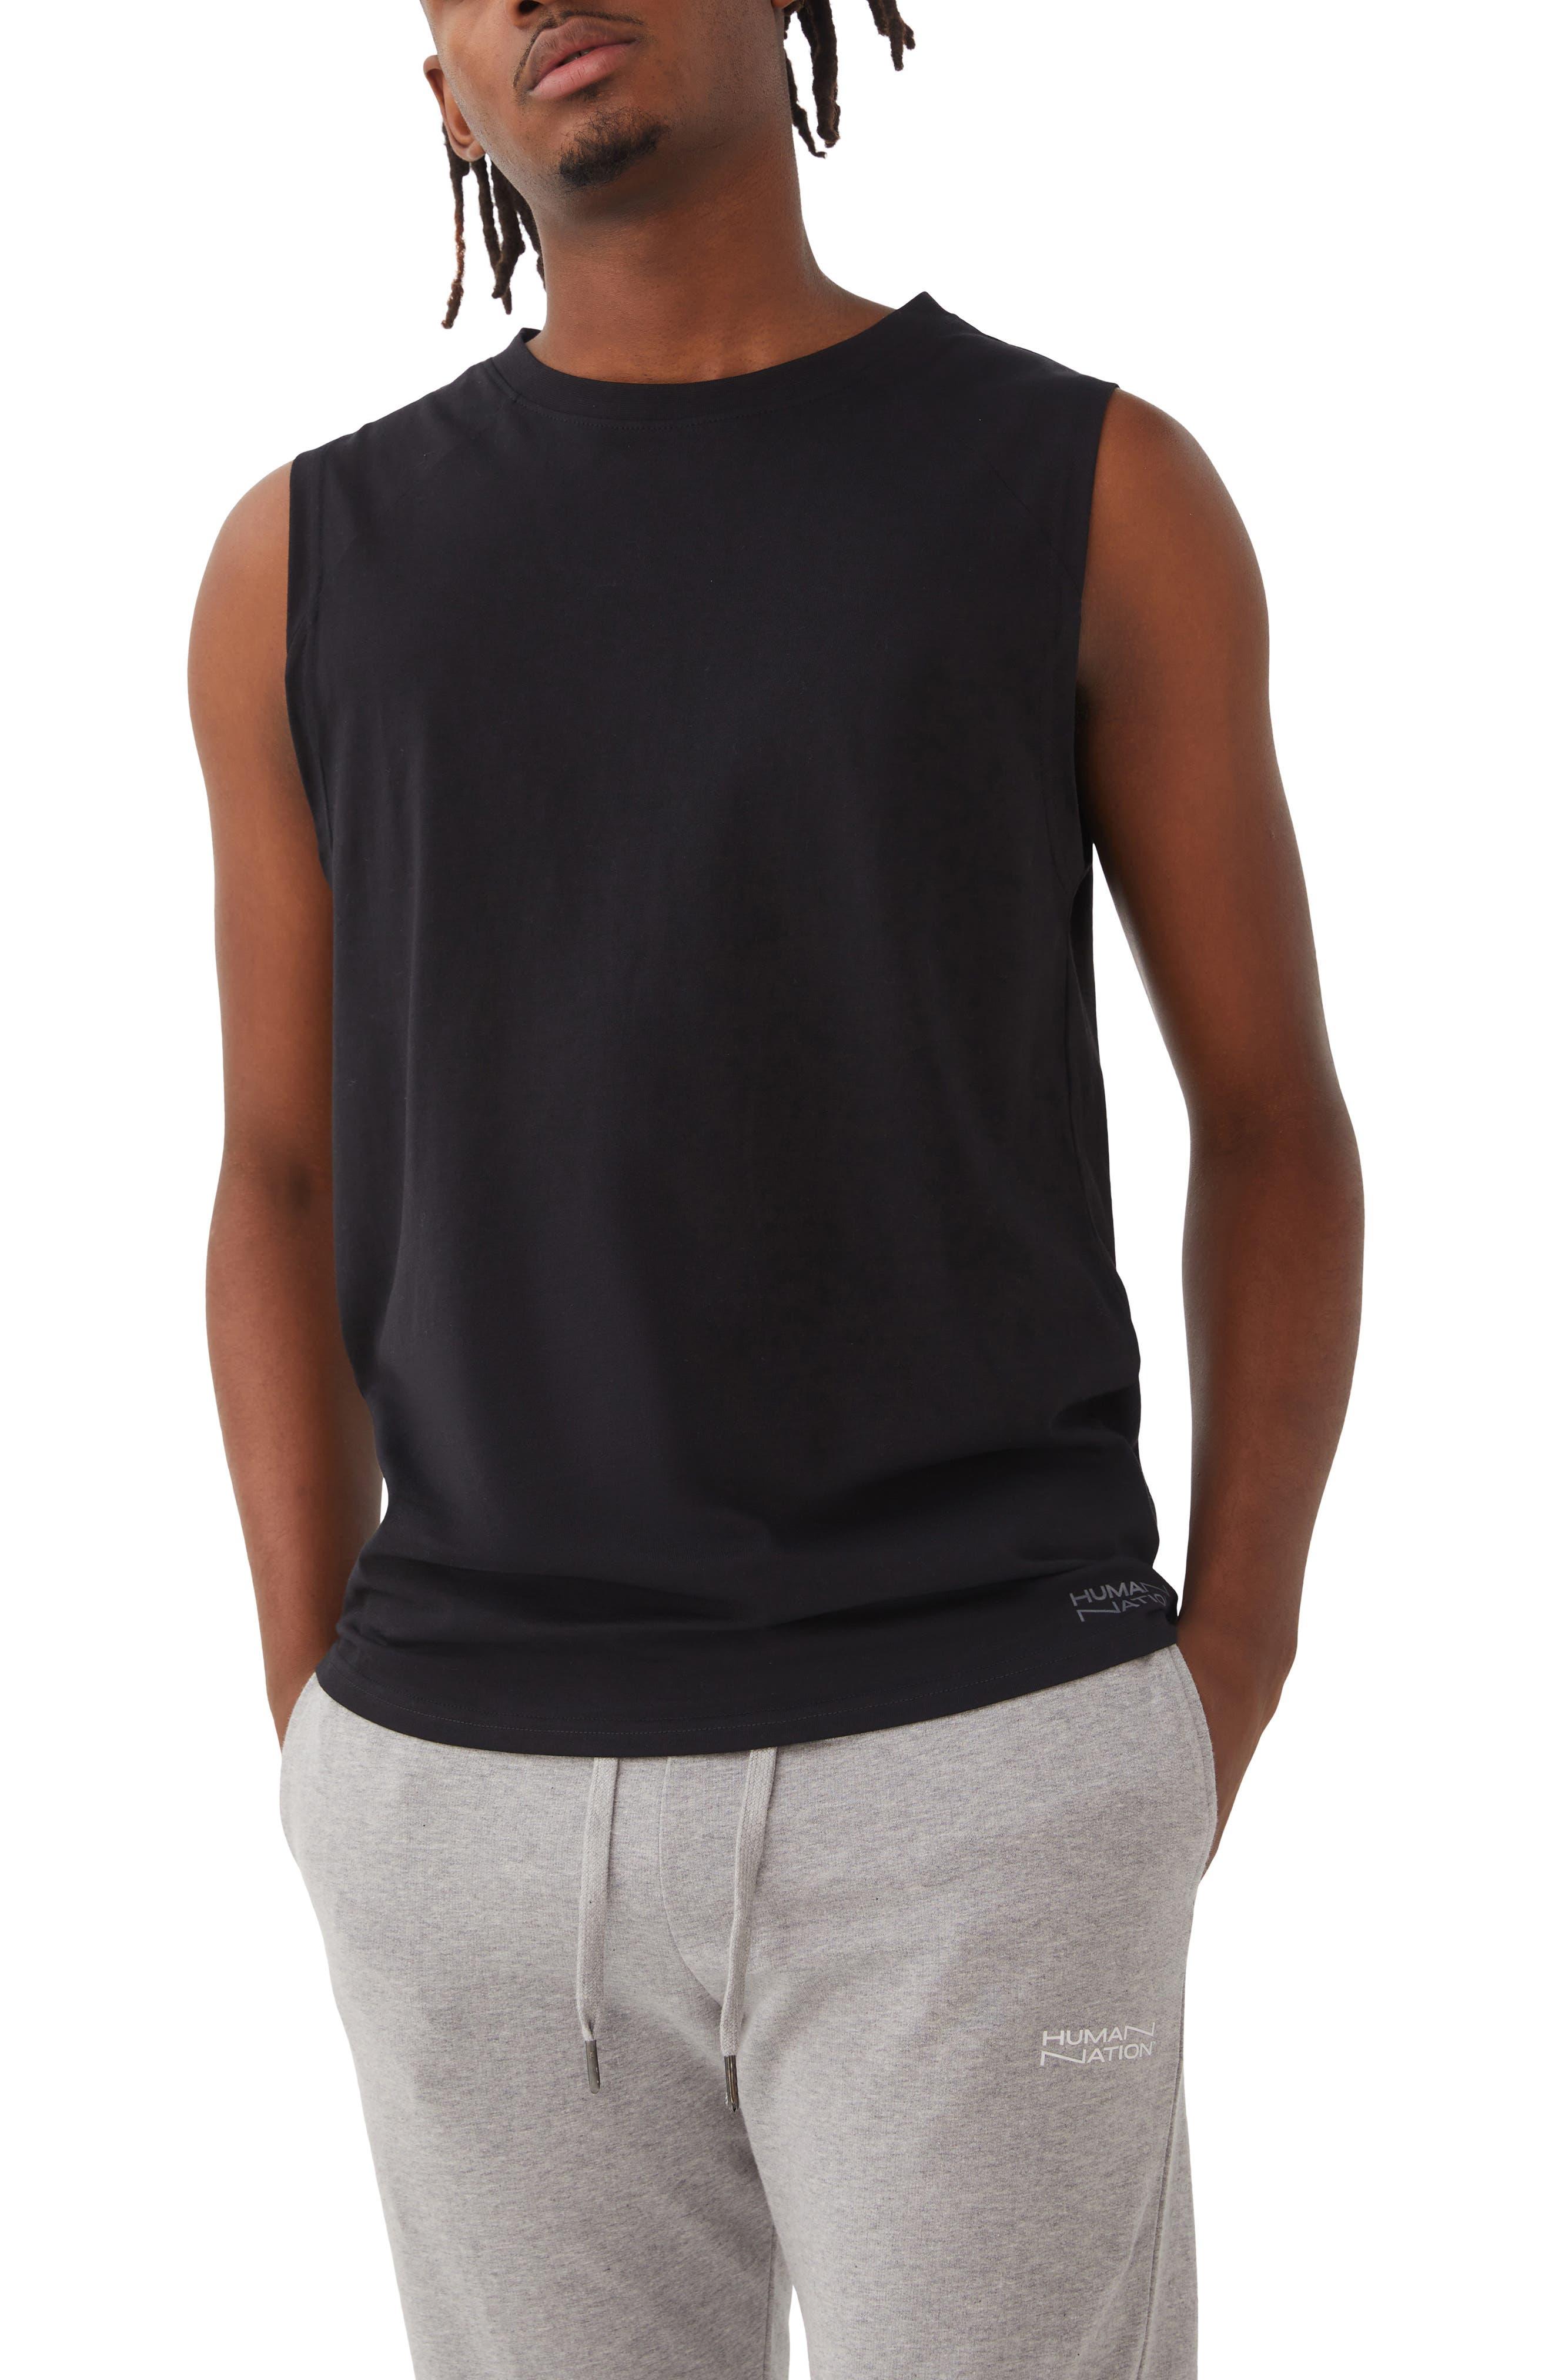 Gender Inclusive Big Mood Organic Cotton Muscle T-Shirt